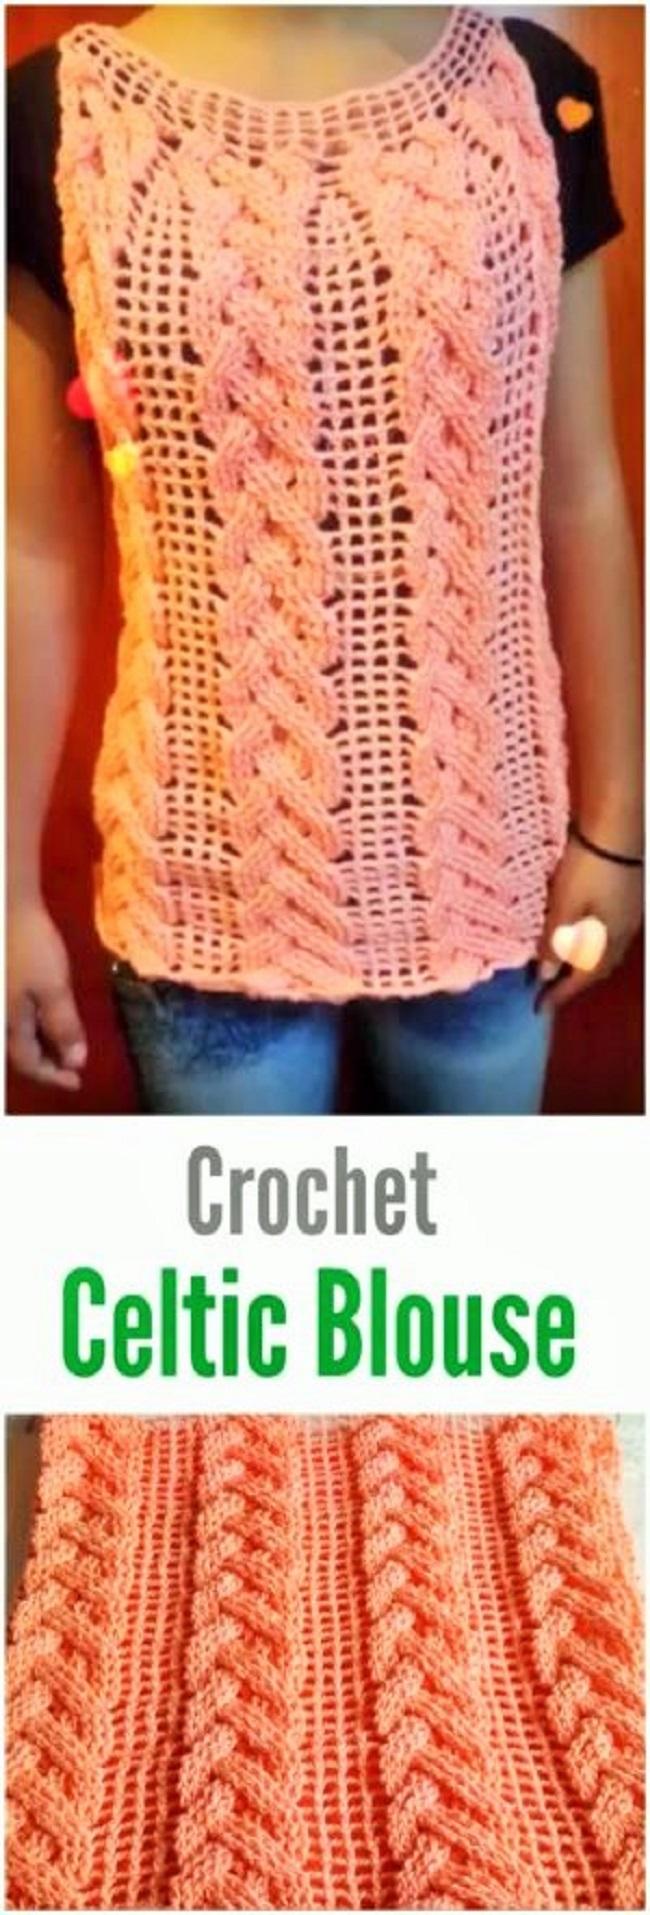 Home made Diy crochet Ideas-13